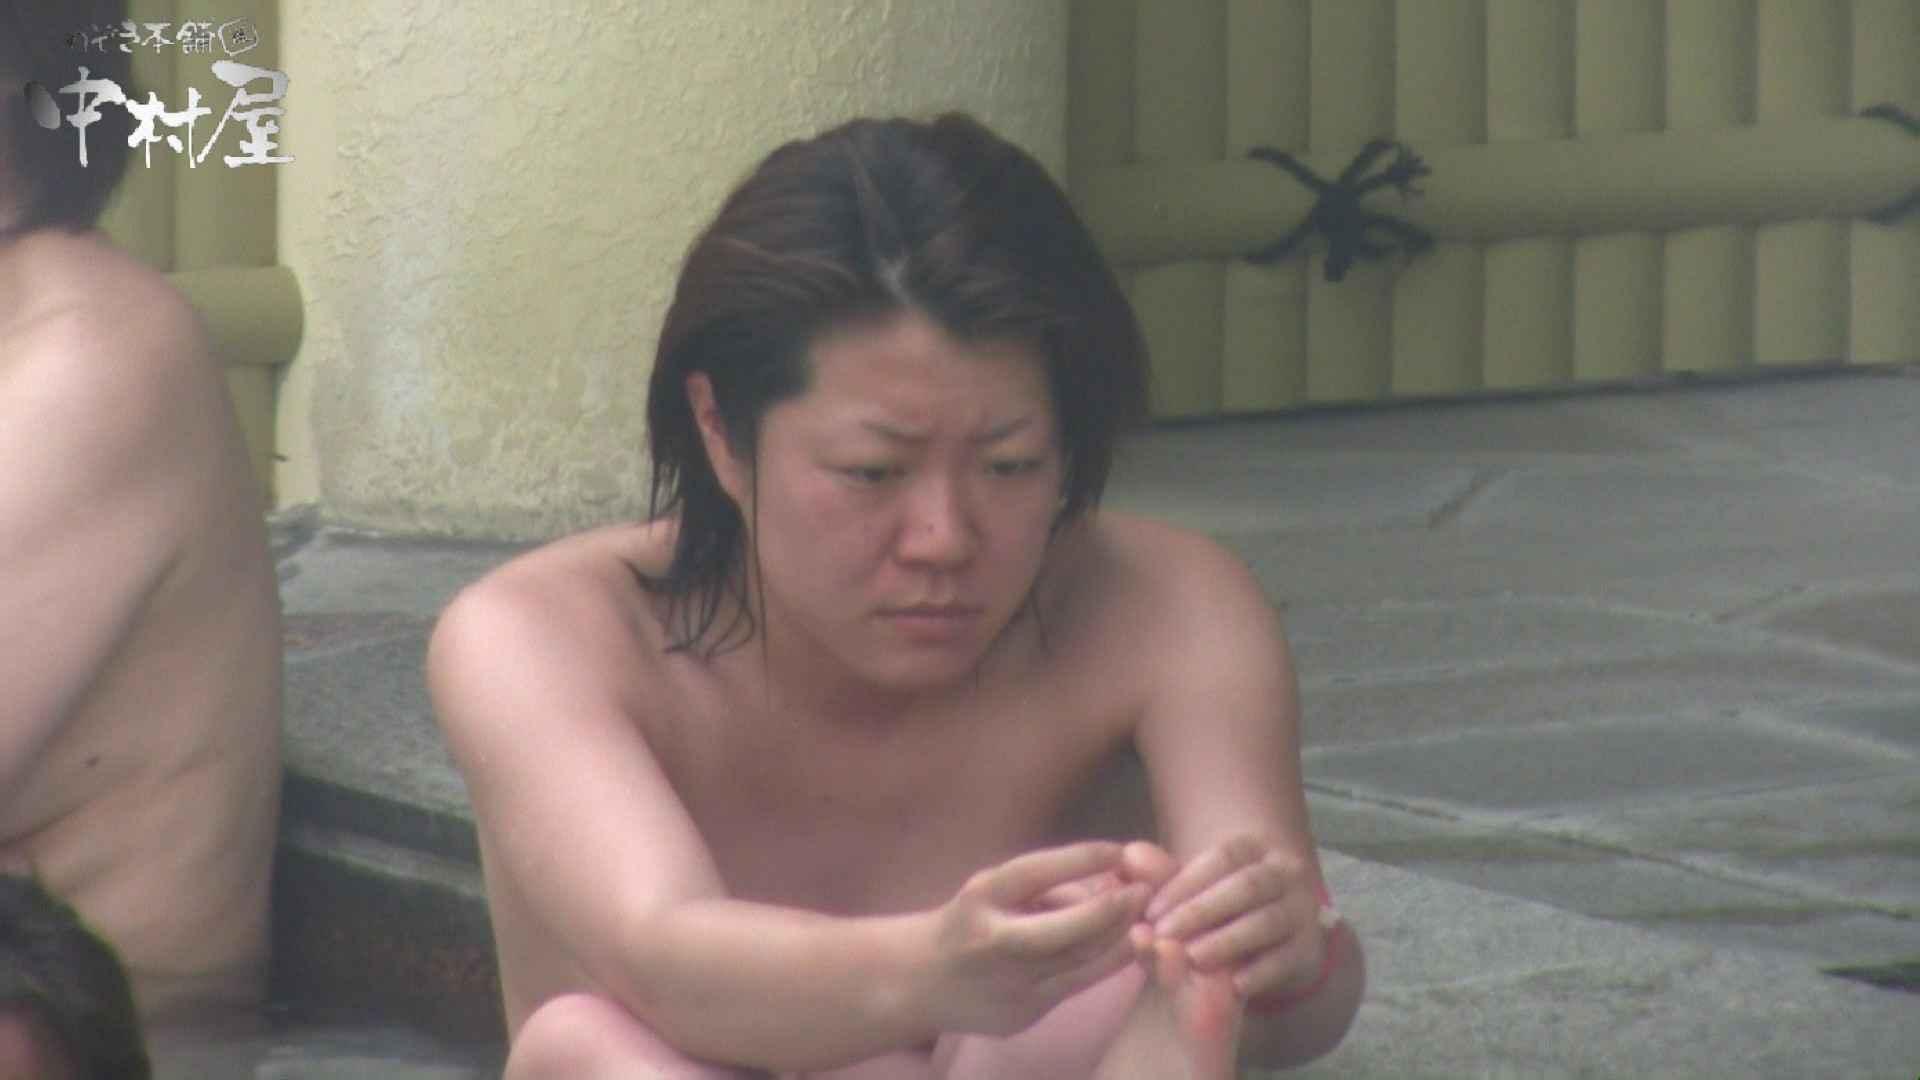 Aquaな露天風呂Vol.885 露天風呂 | OLのエロ生活  27連発 10